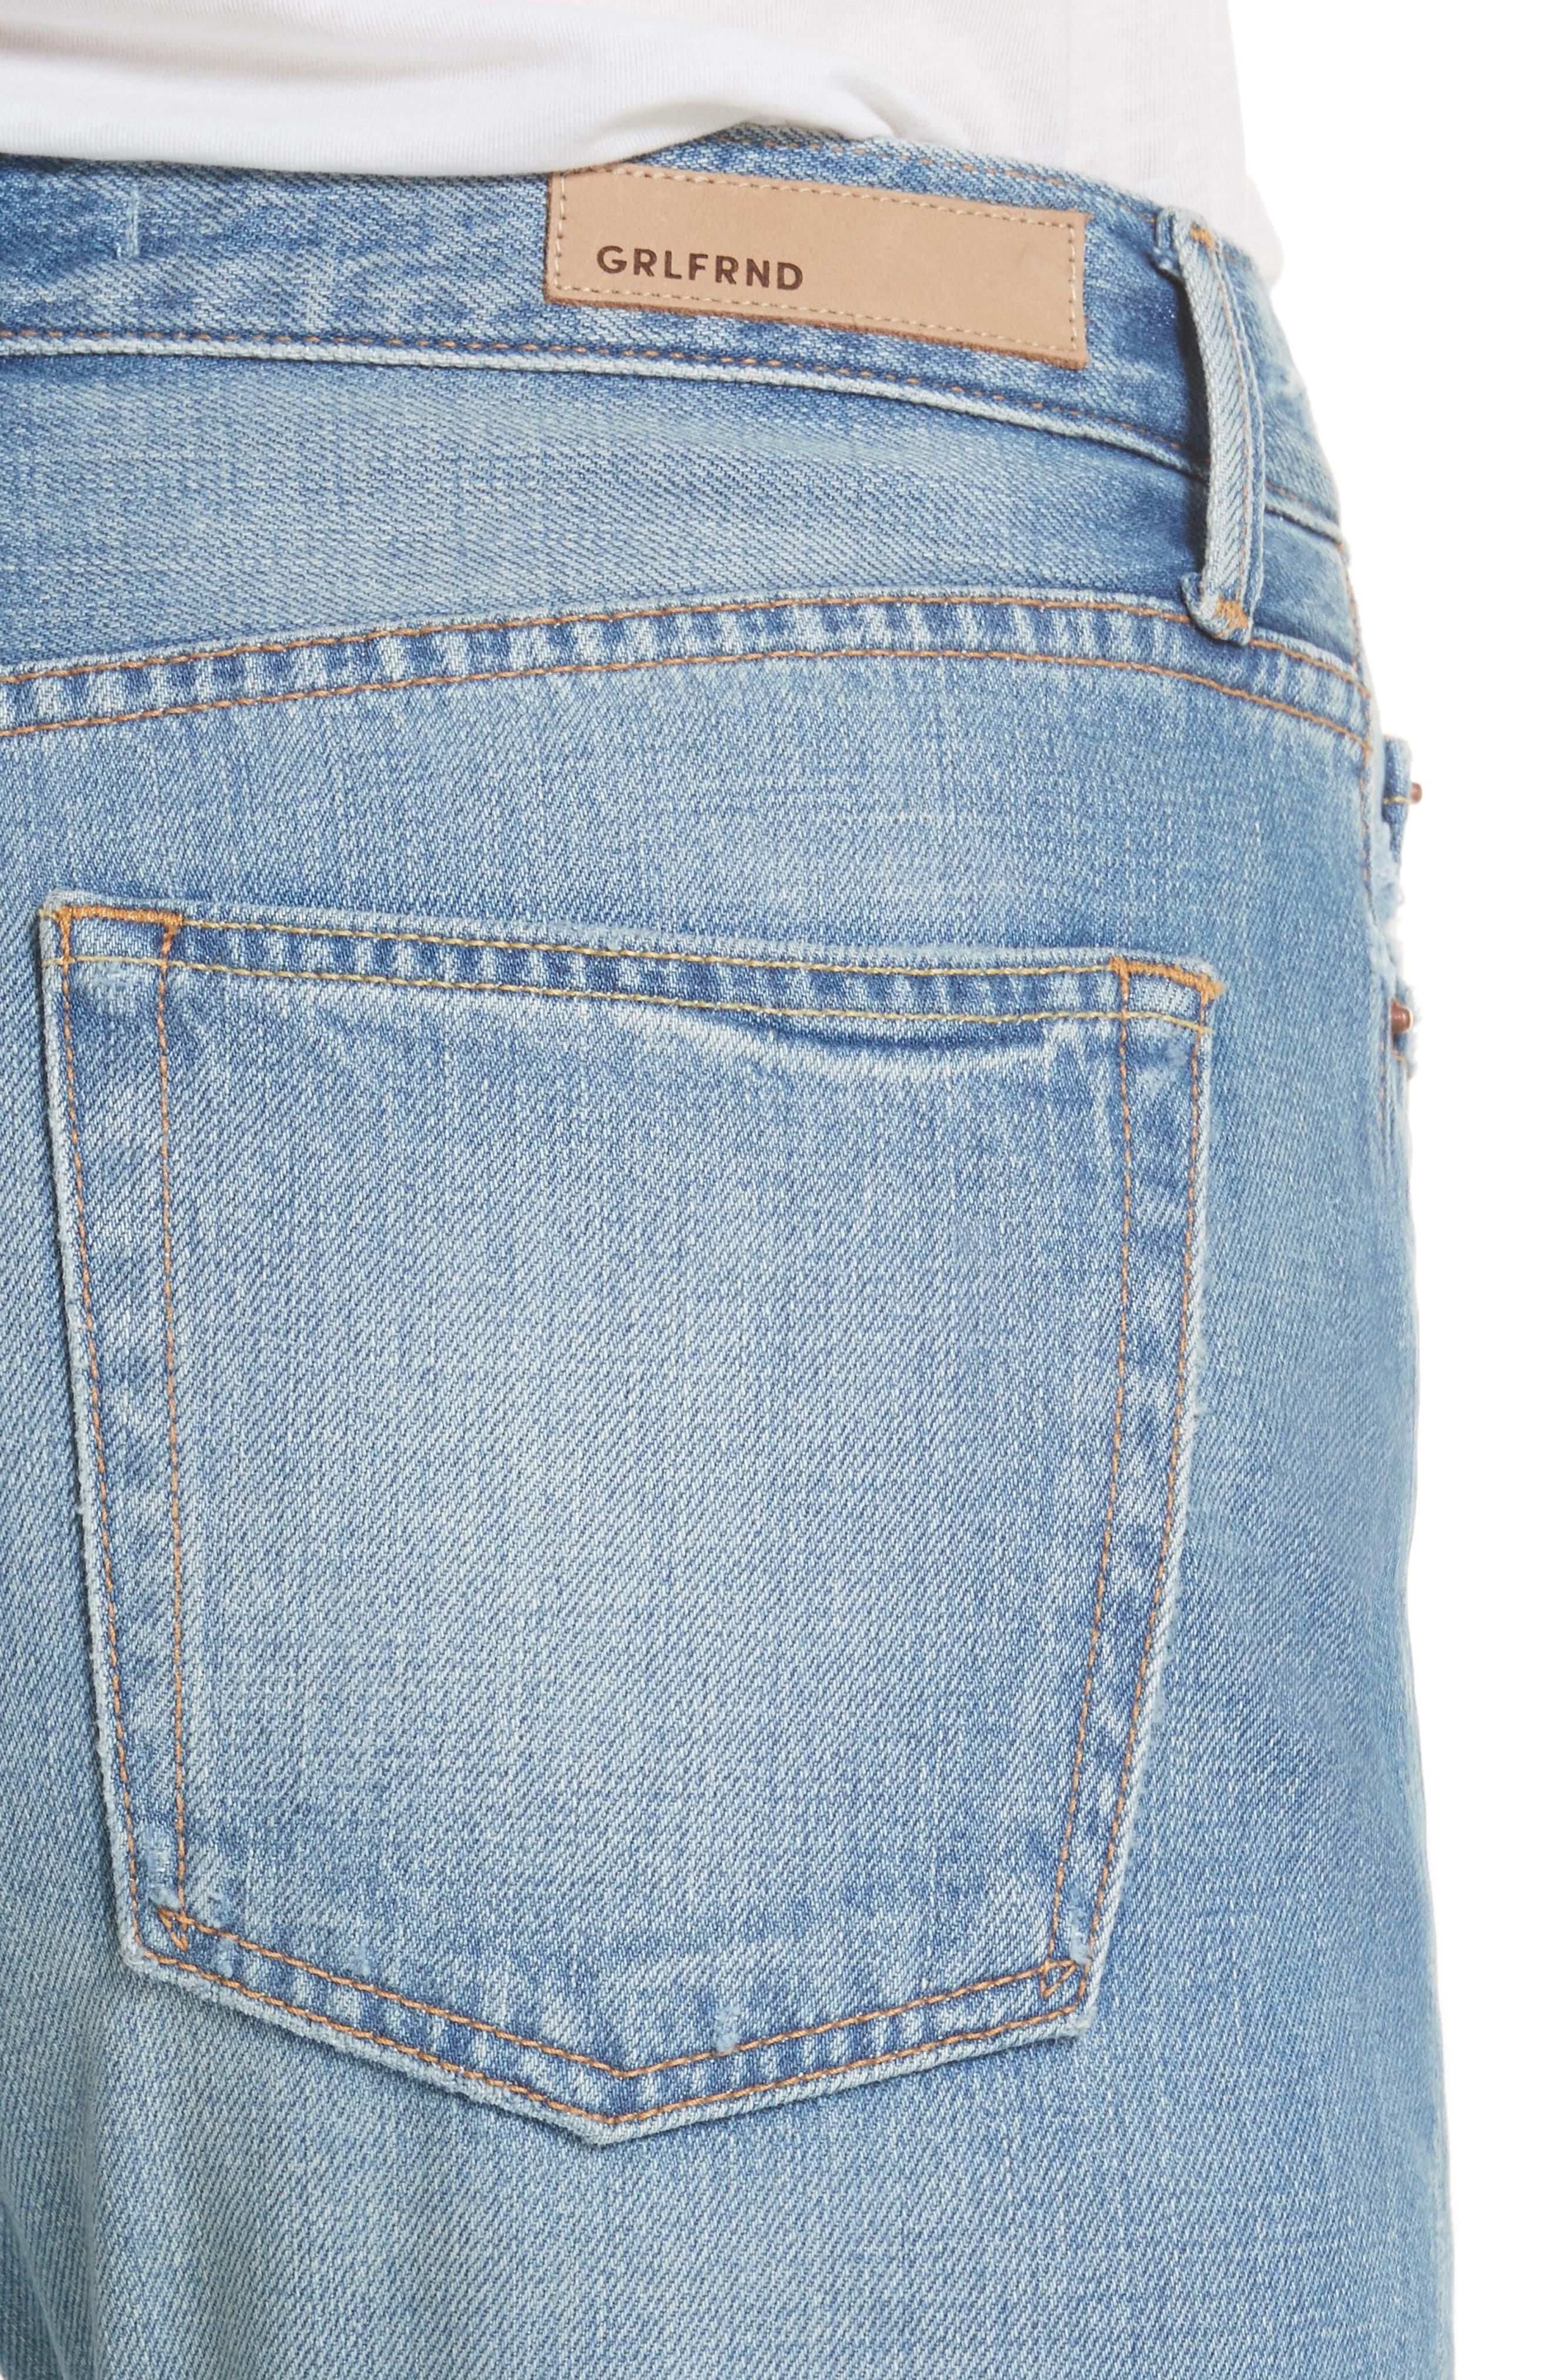 Kiara High Waist Ankle Boyfriend Jeans,                             Alternate thumbnail 4, color,                             464